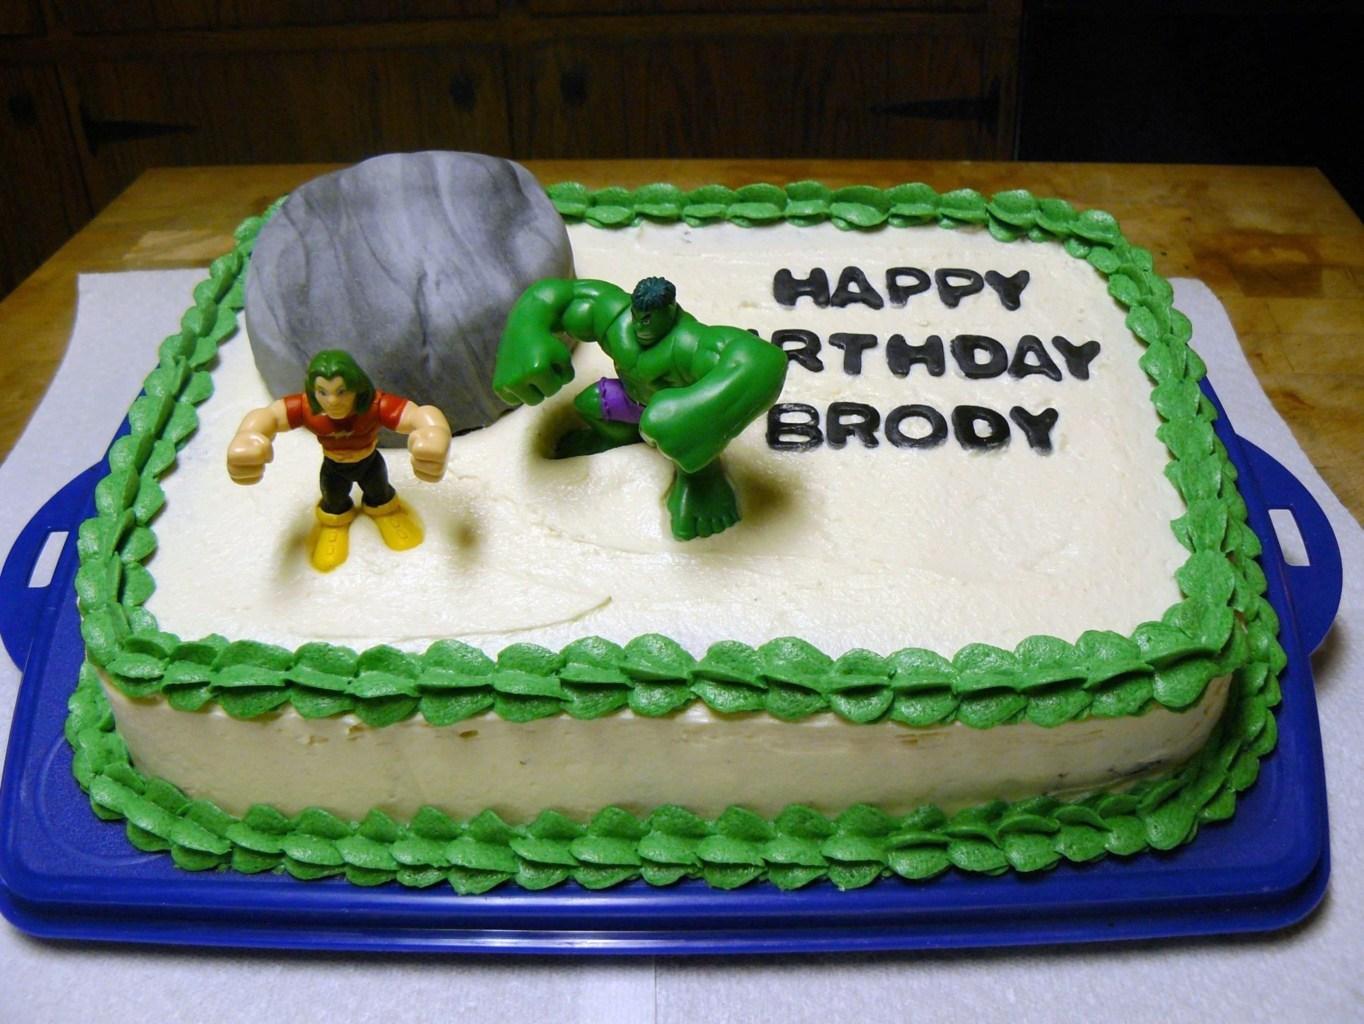 Hulk cake template sampletemplatess sampletemplatess hulk cake template maxwellsz